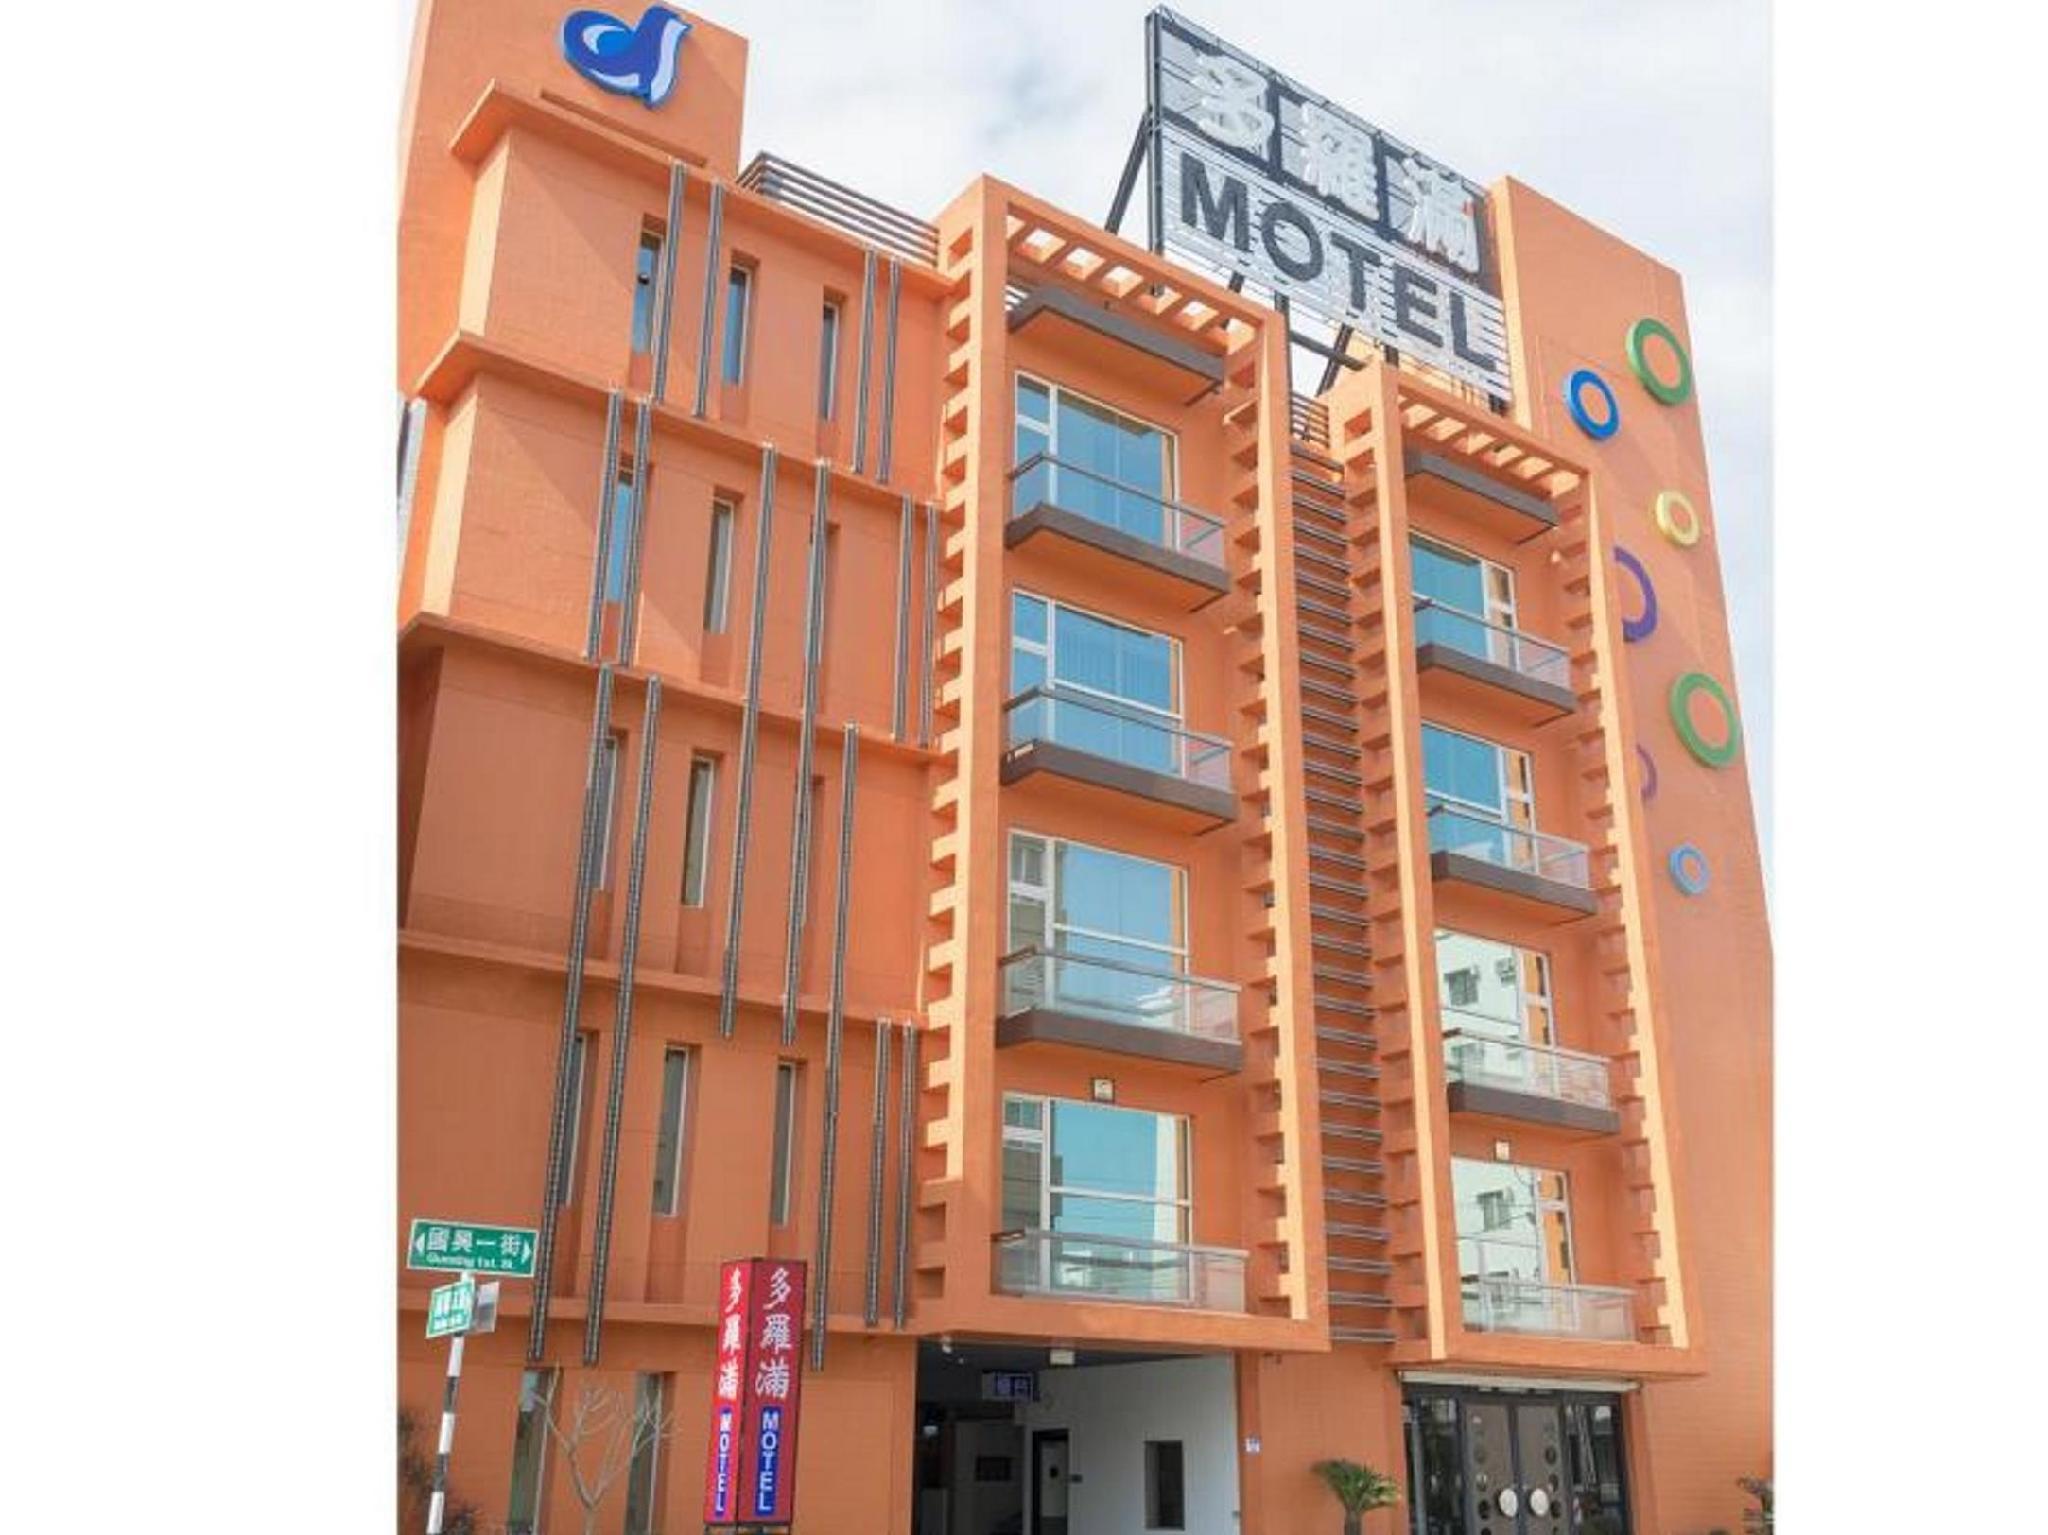 Duo Romance Hotel